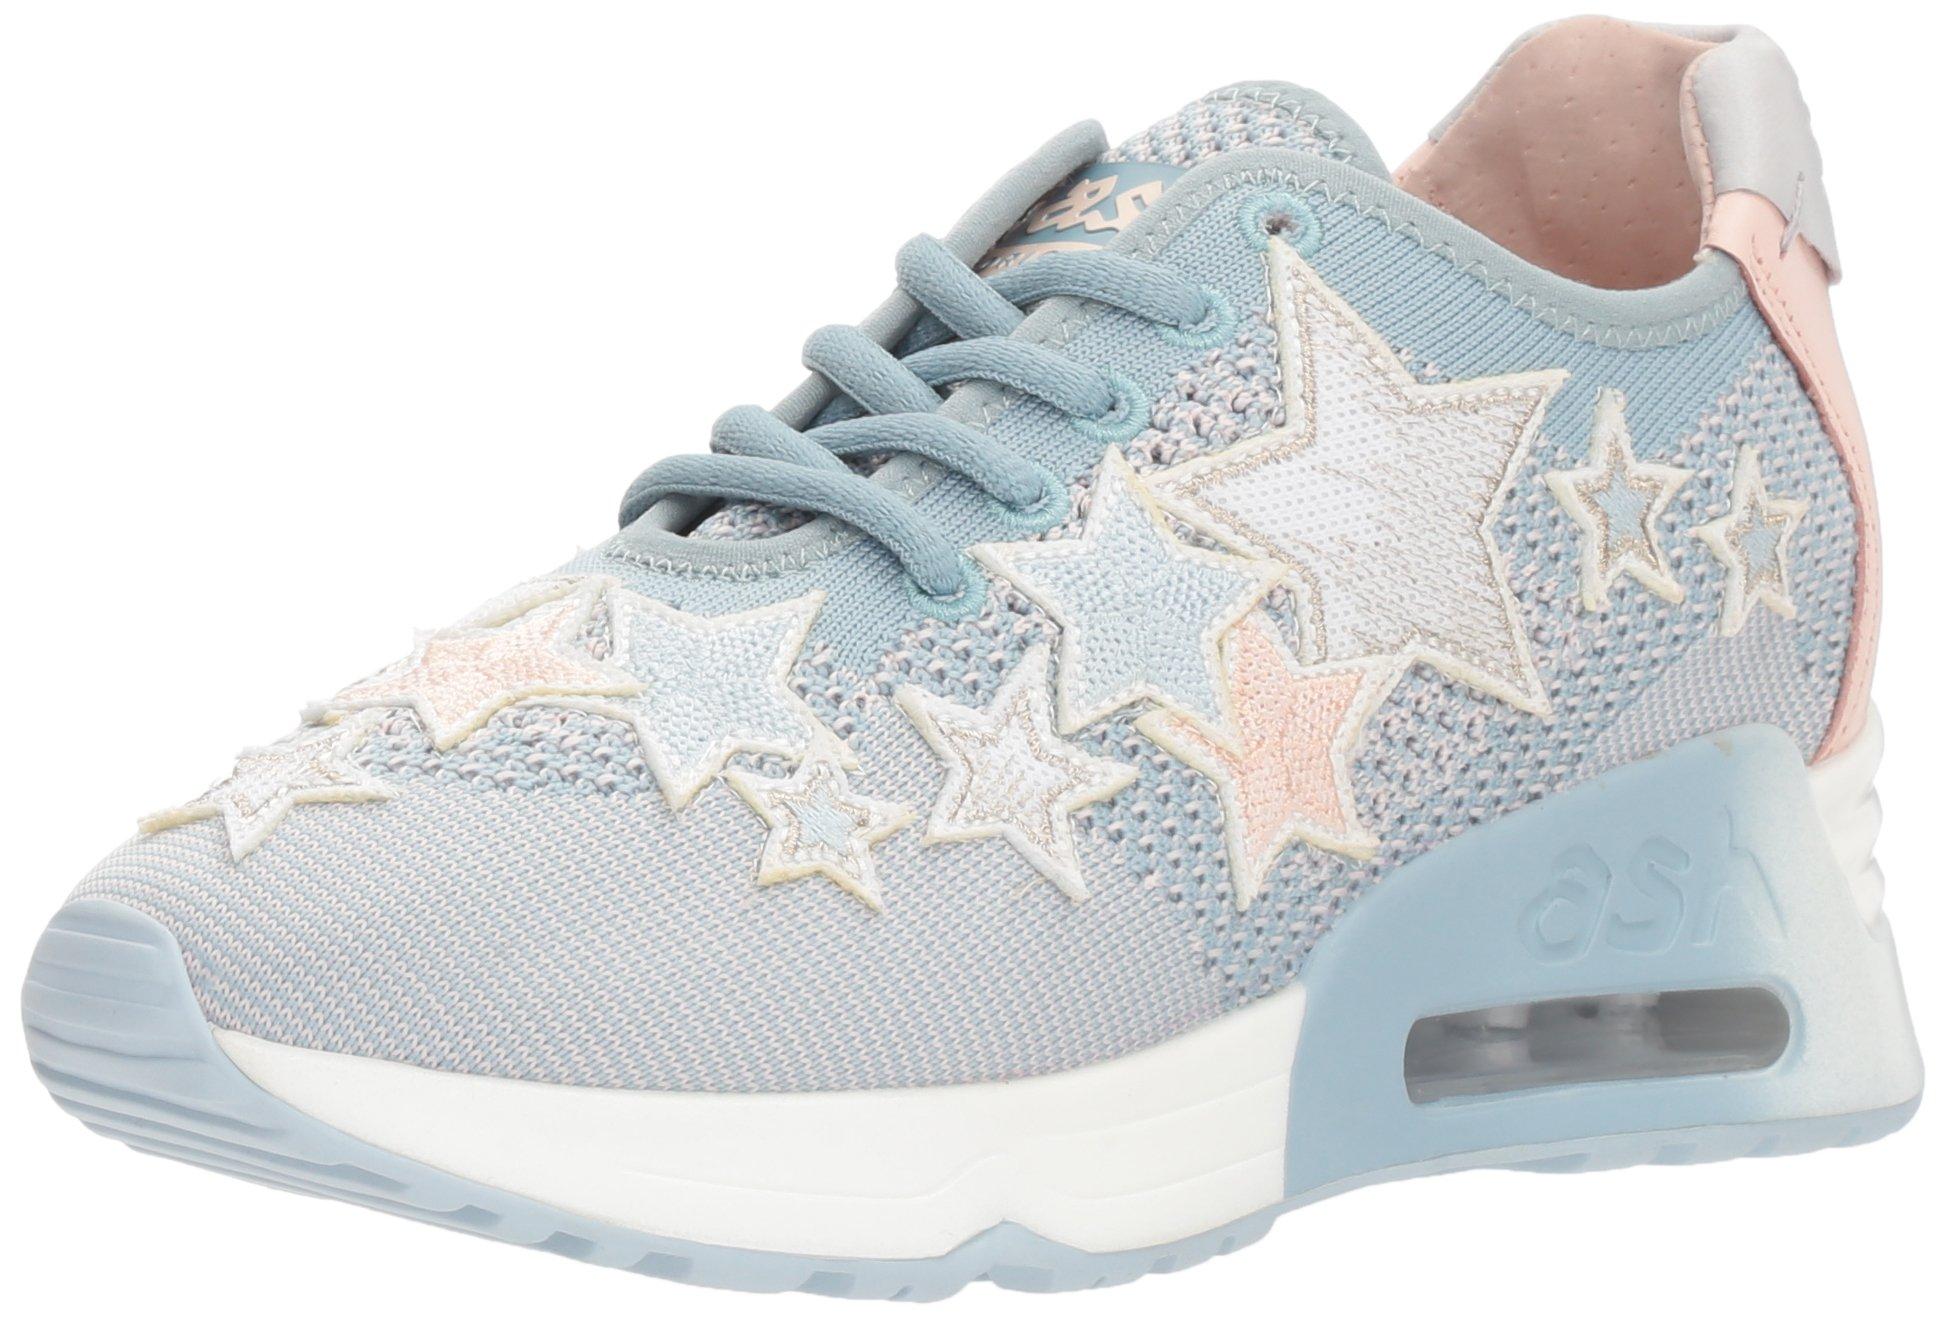 Ash Women's AS-Lucky Star Sneaker, Ice Blue/Power, 38 M EU (8 US)